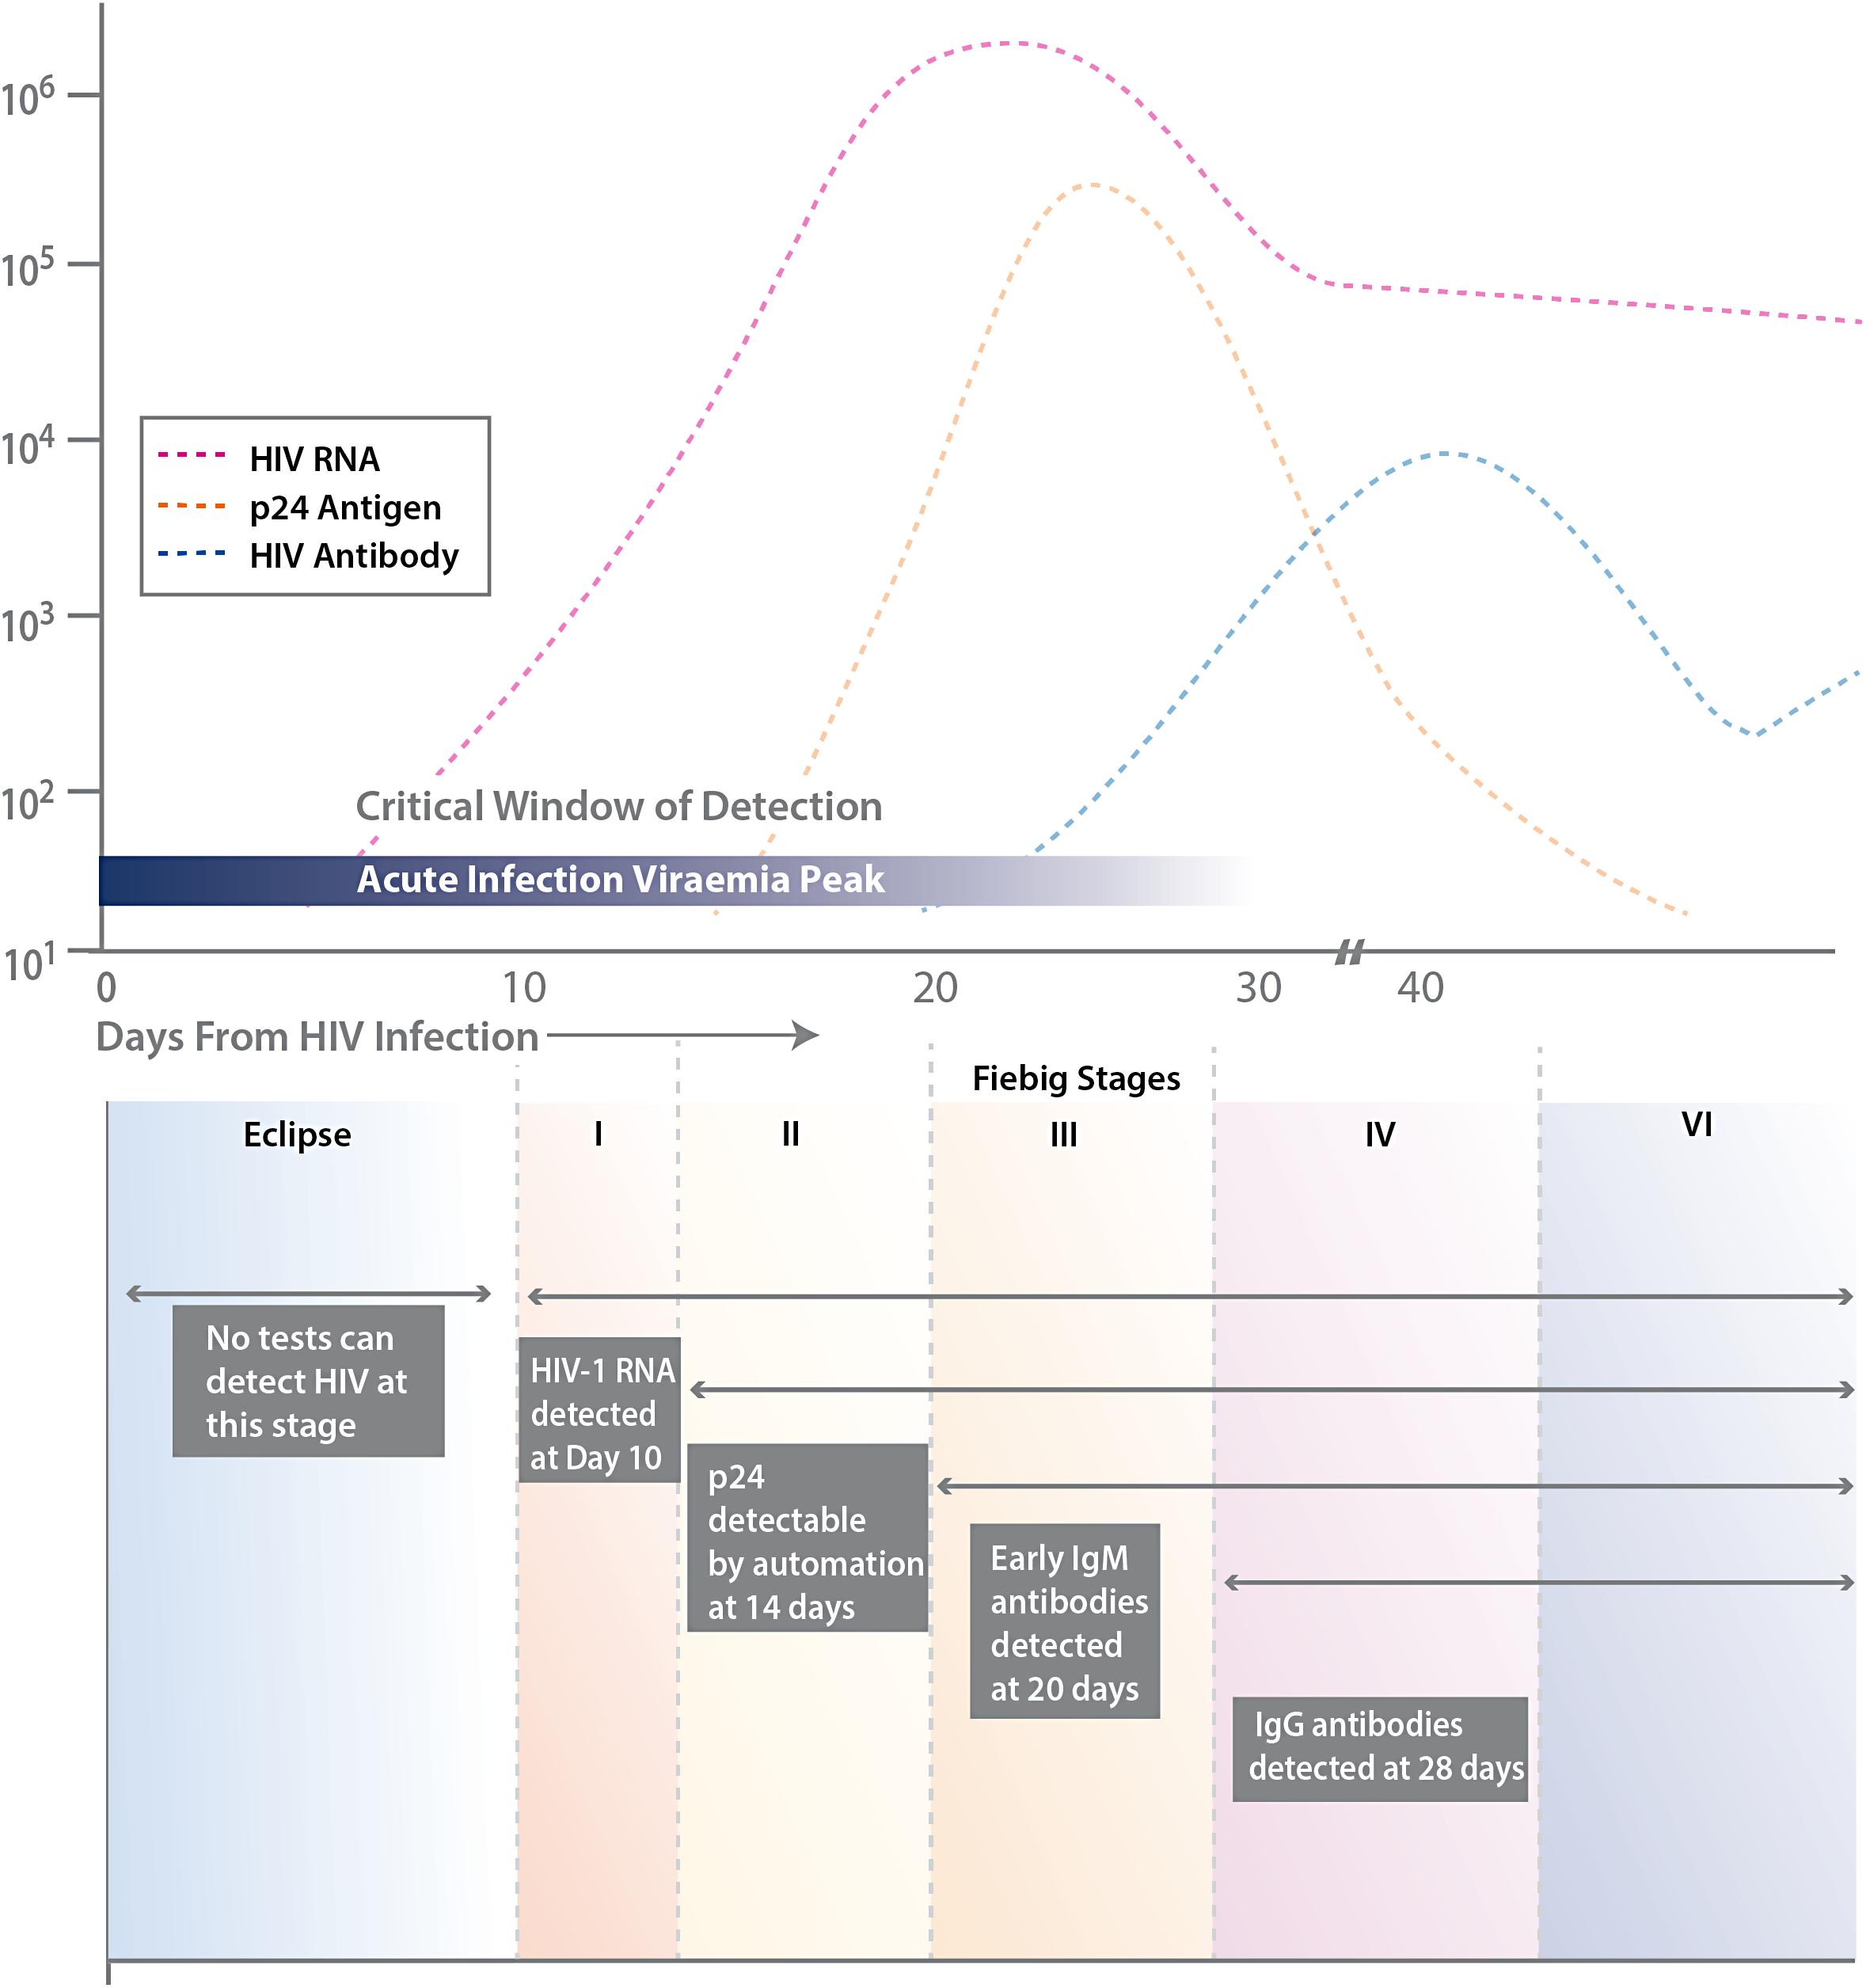 Human anti-HIV IgM detection by the OraQuick ADVANCE® Rapid